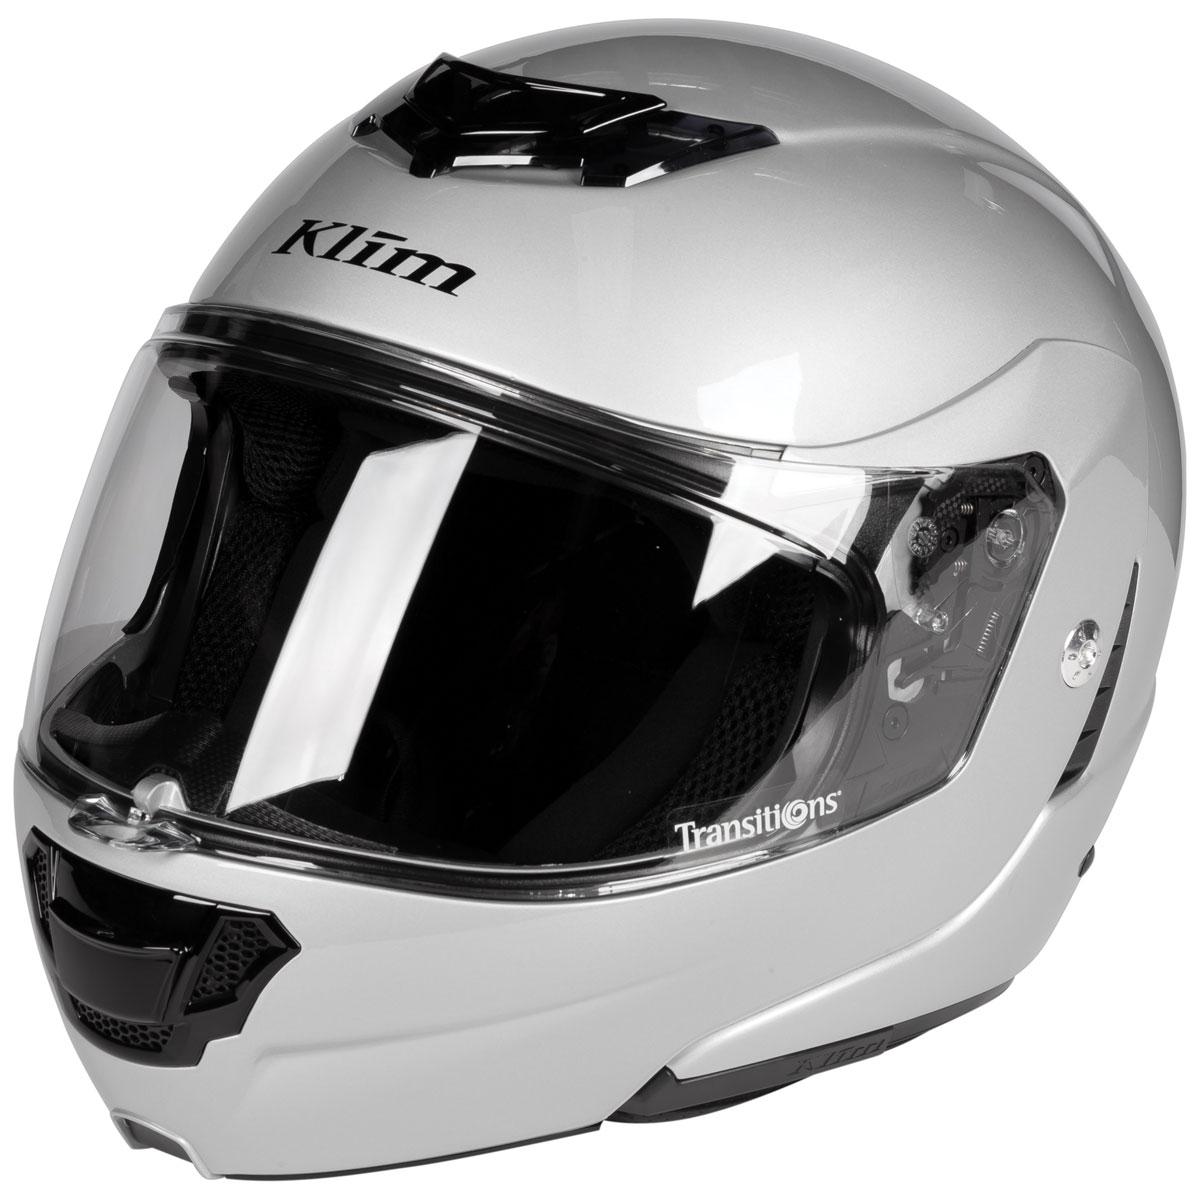 Klim TK1200 Silver Modular Helmet